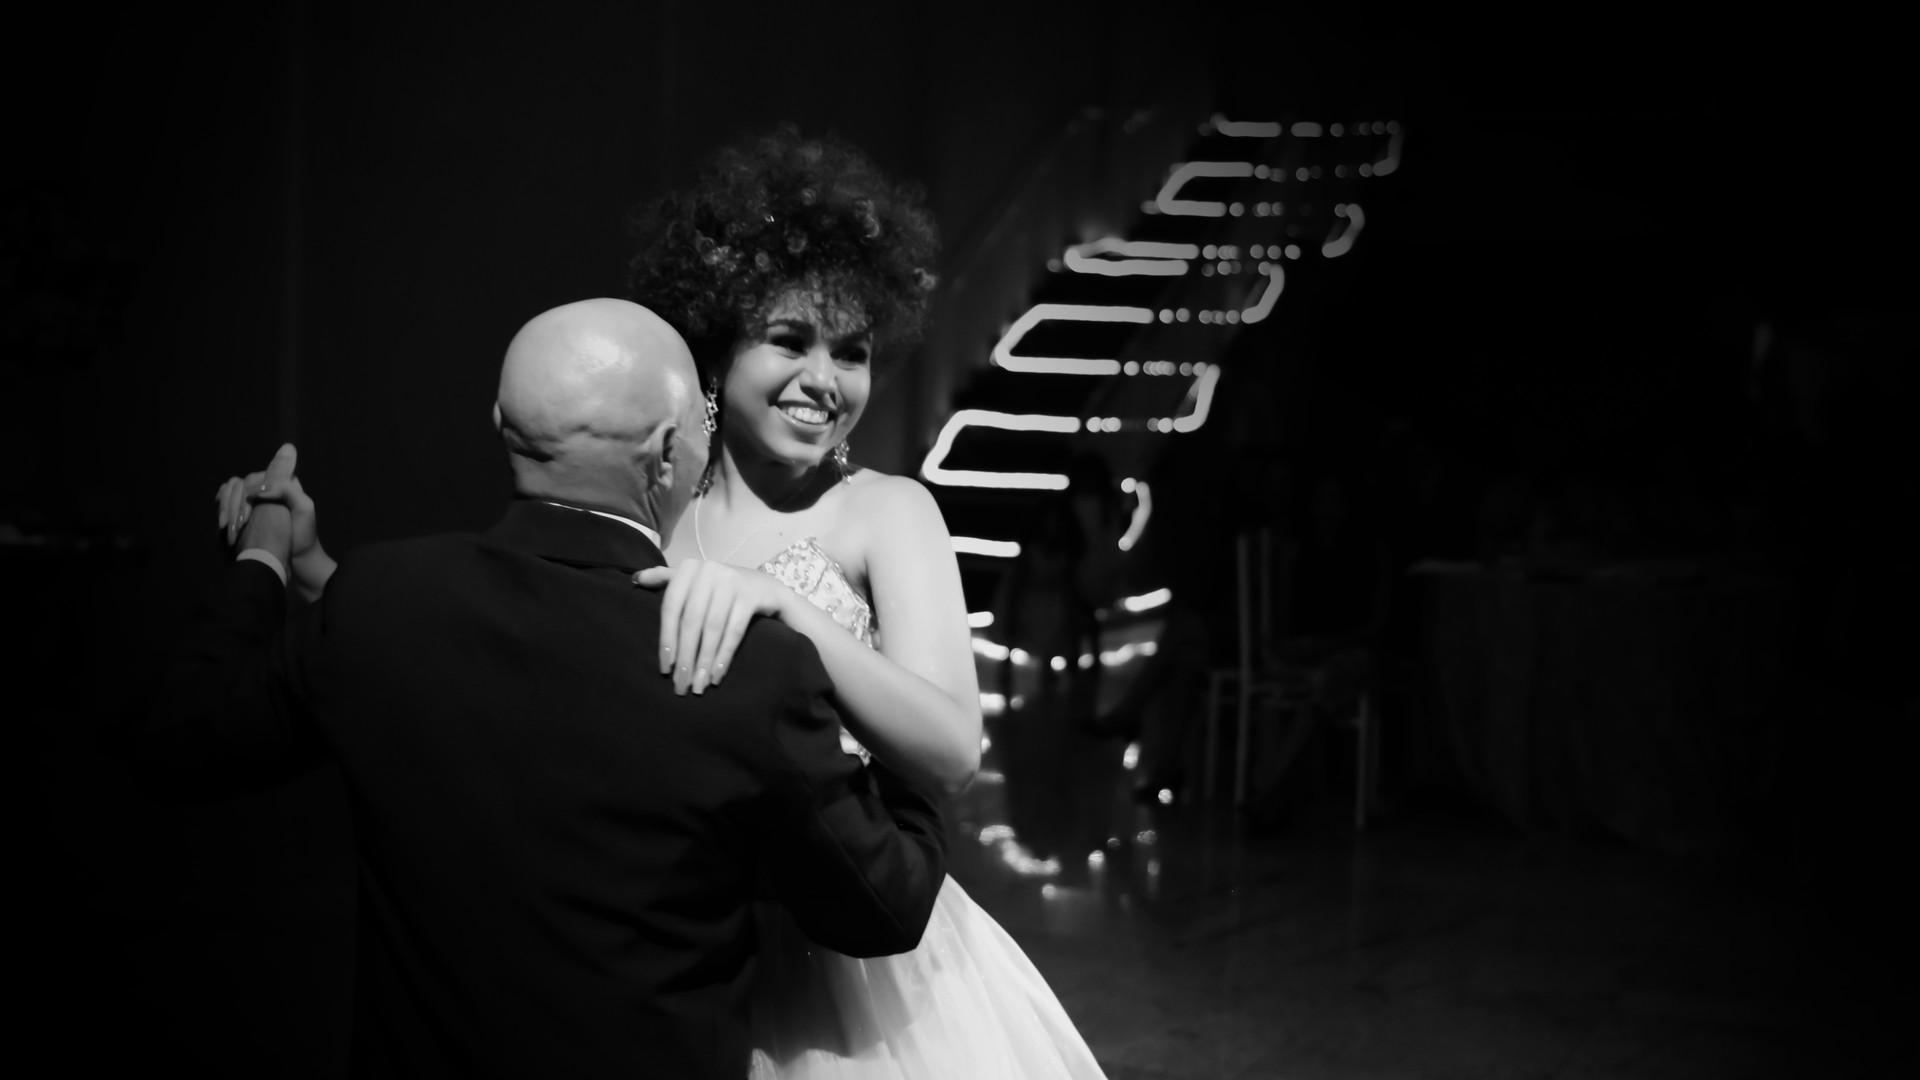 debutante dançando